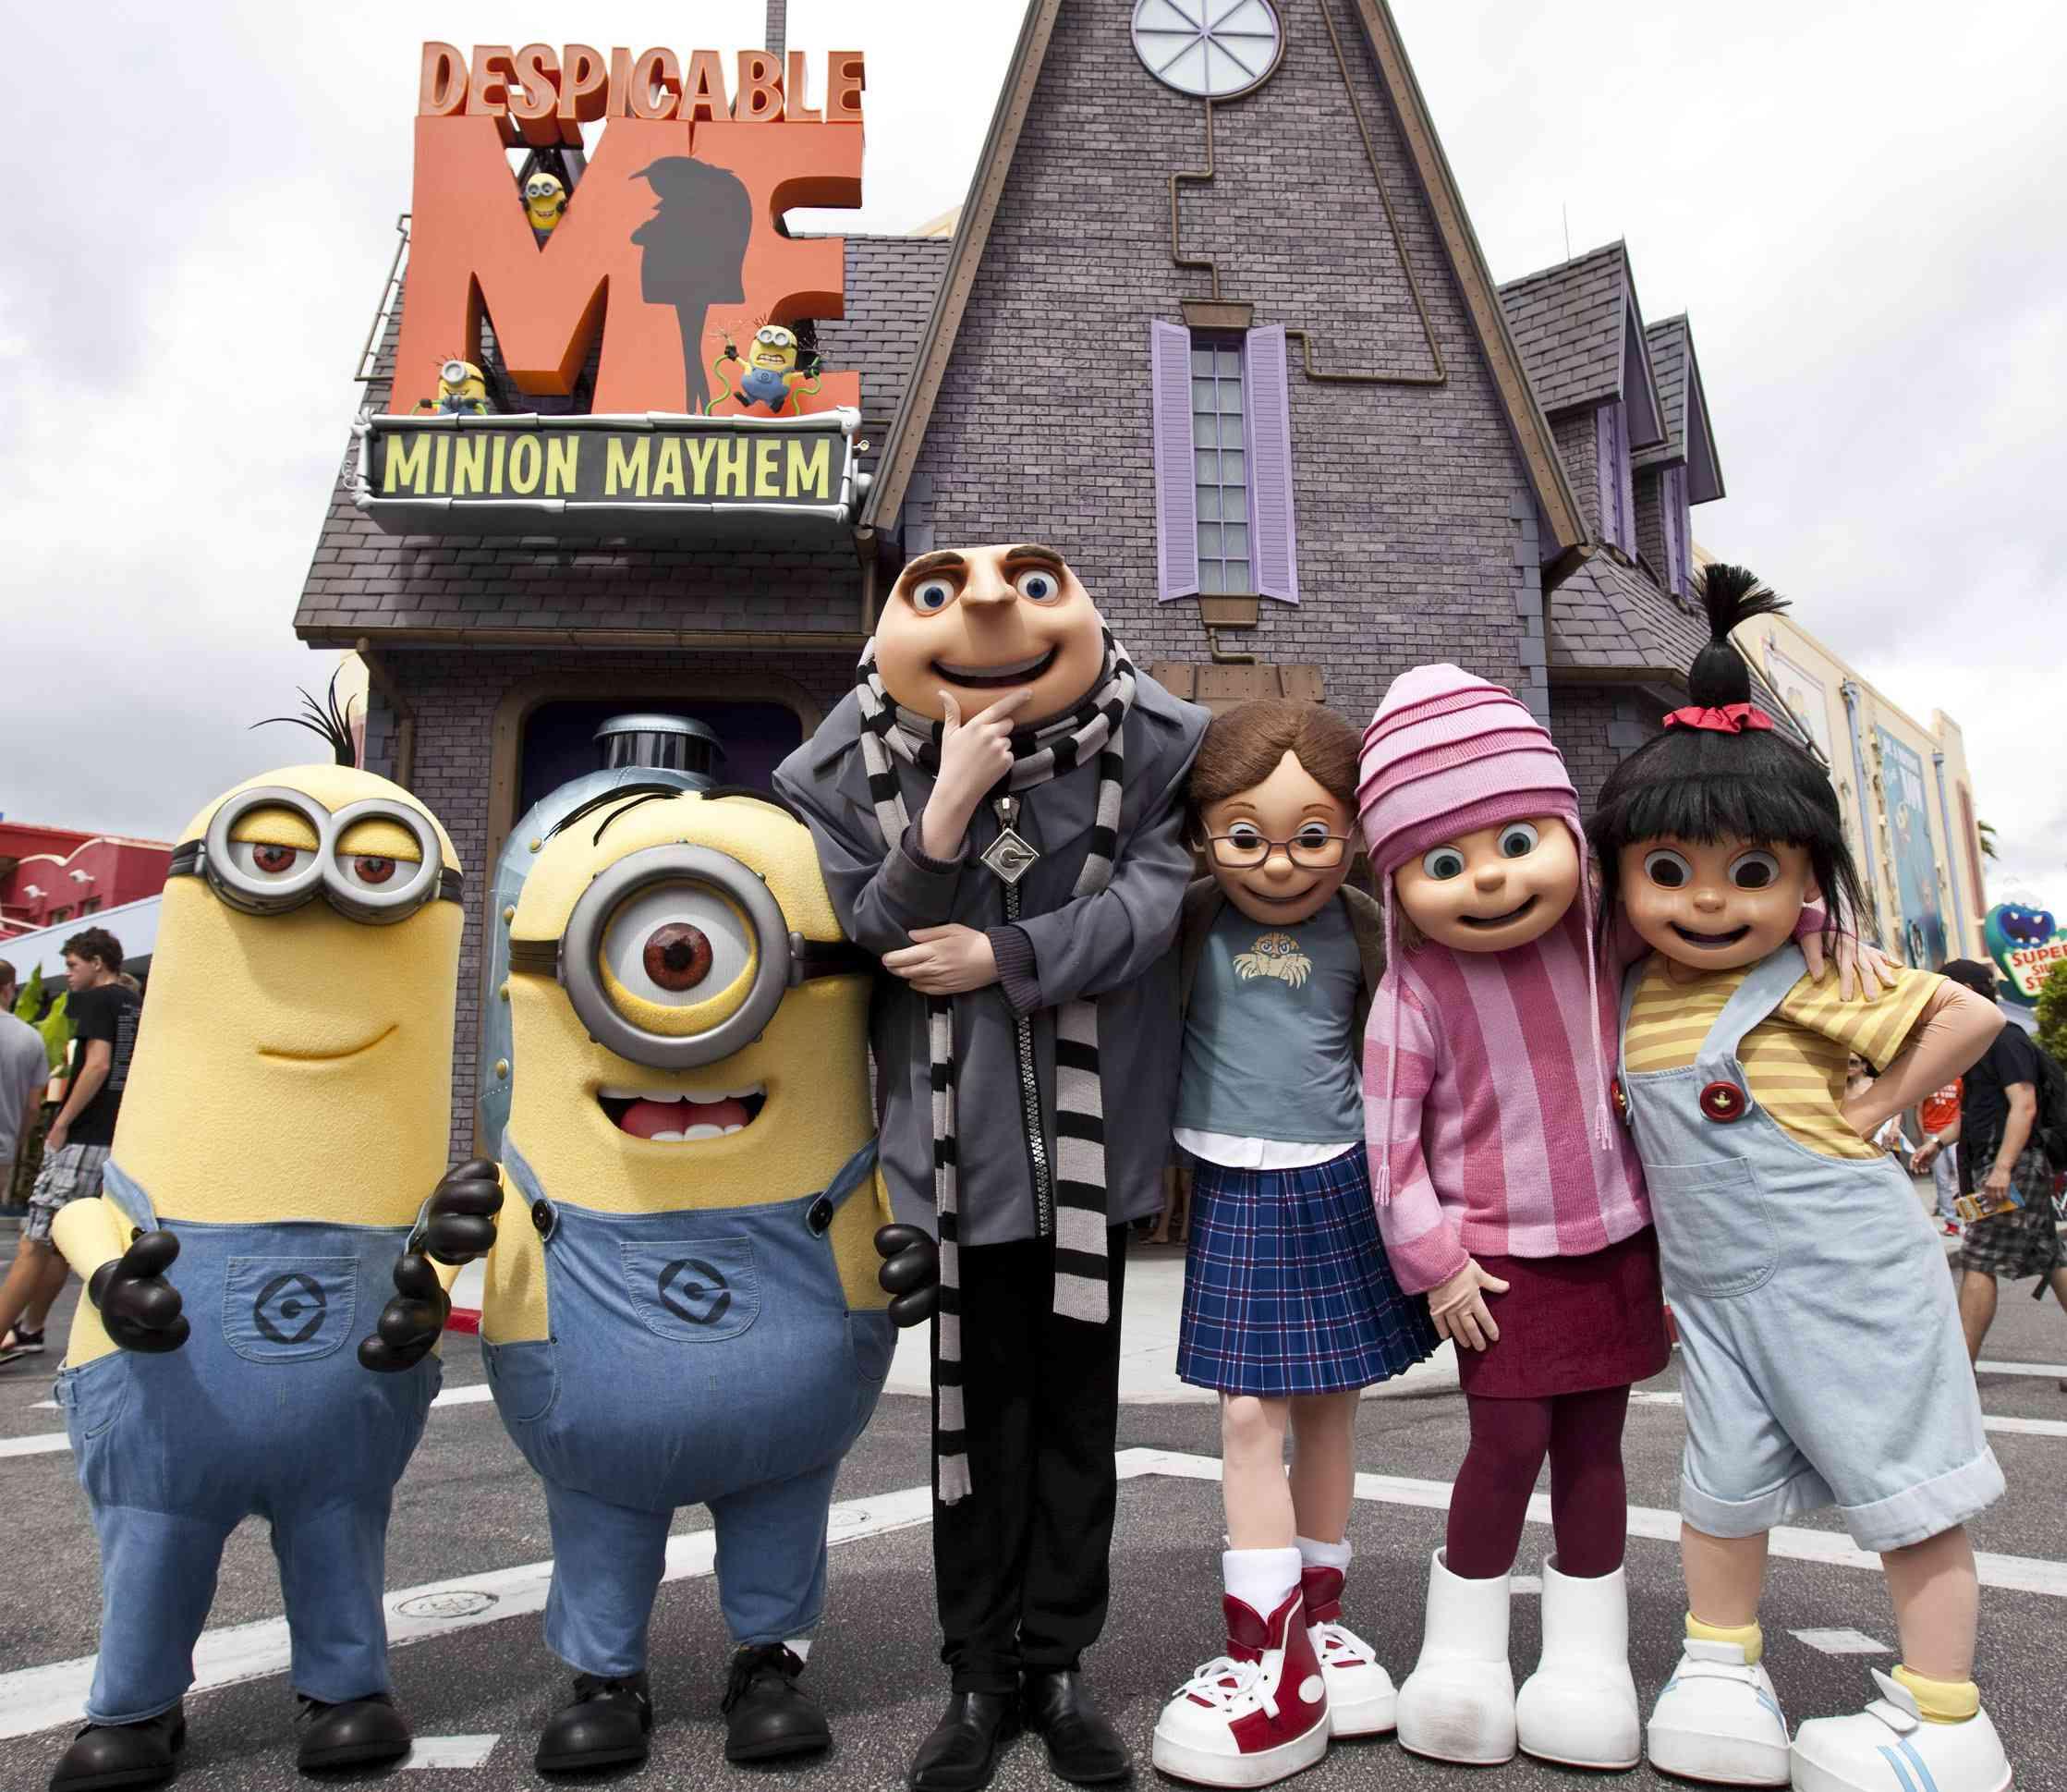 Despicable Me Minion Mayhem ride facade